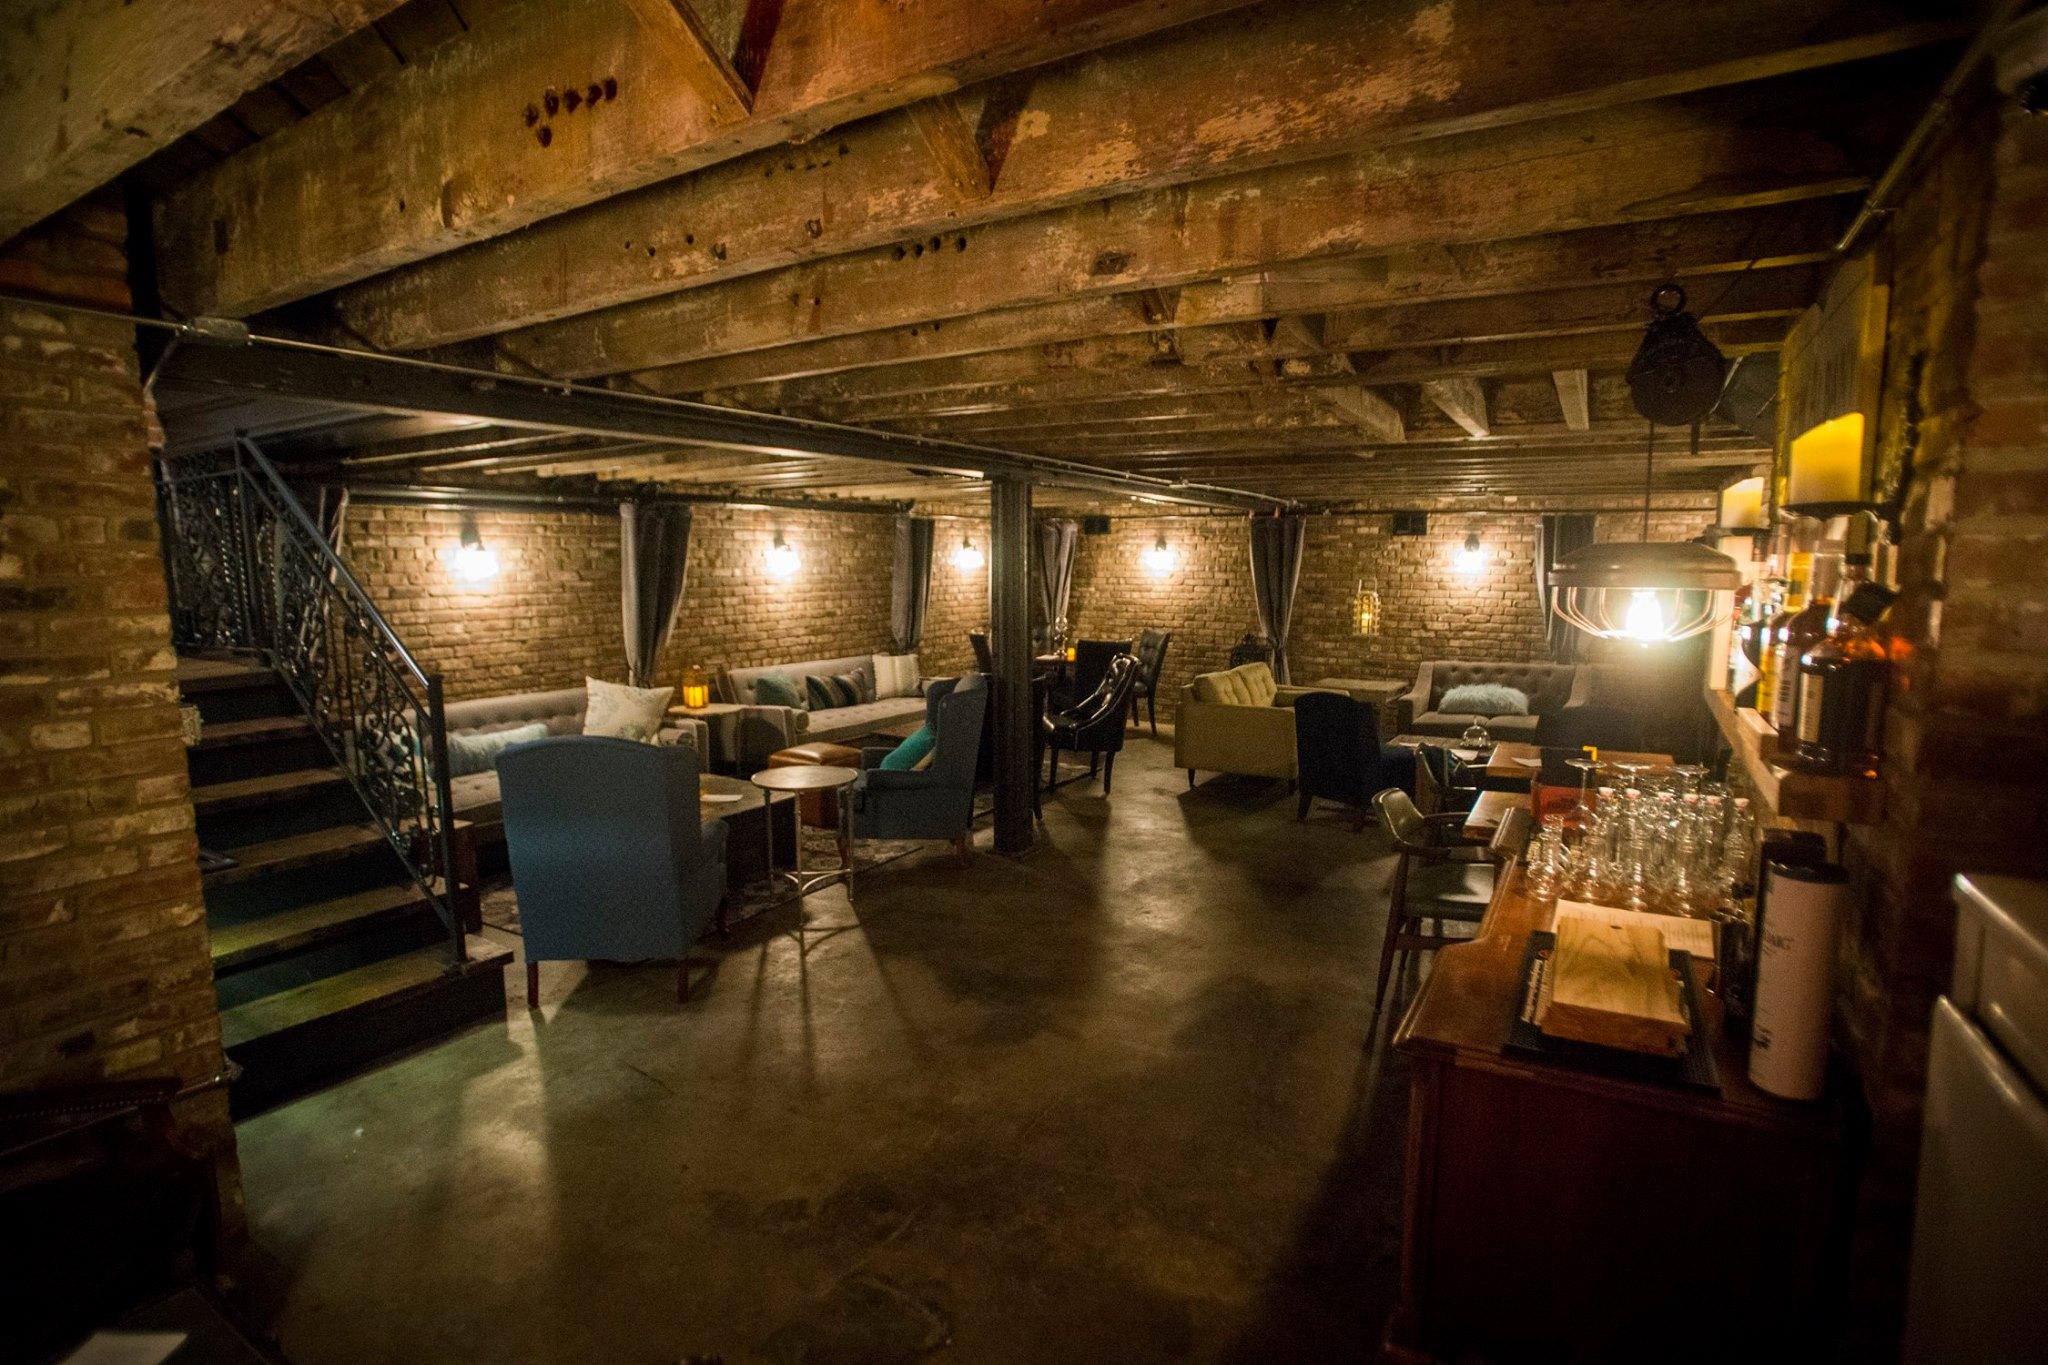 Brooklyn and the Butcher basement